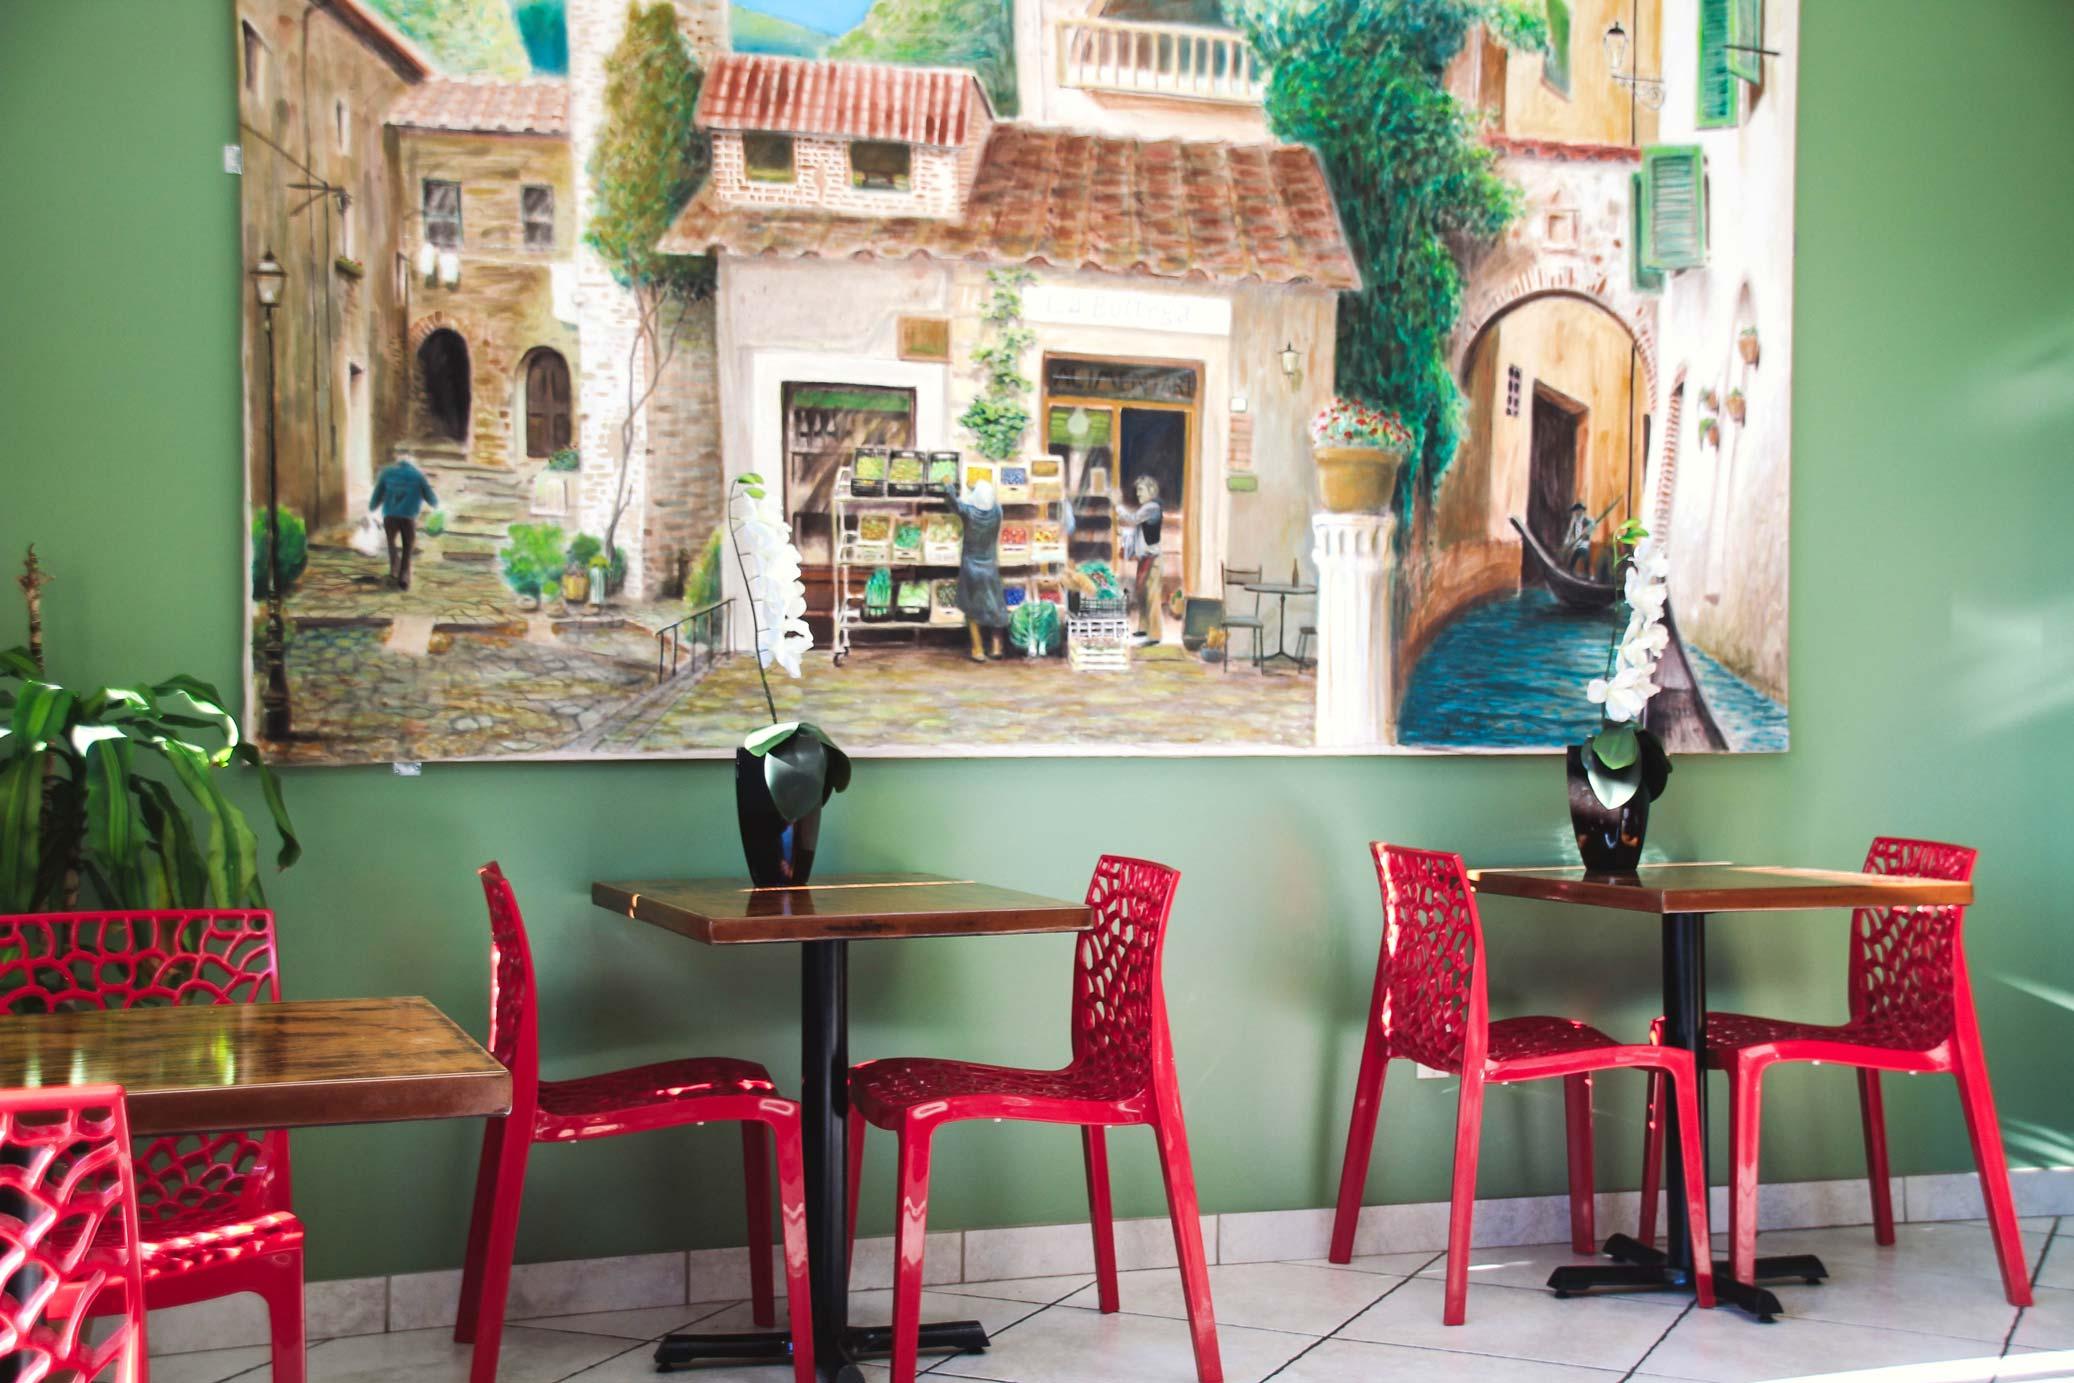 LaBottega Brantford Deli and Catering Restaurant